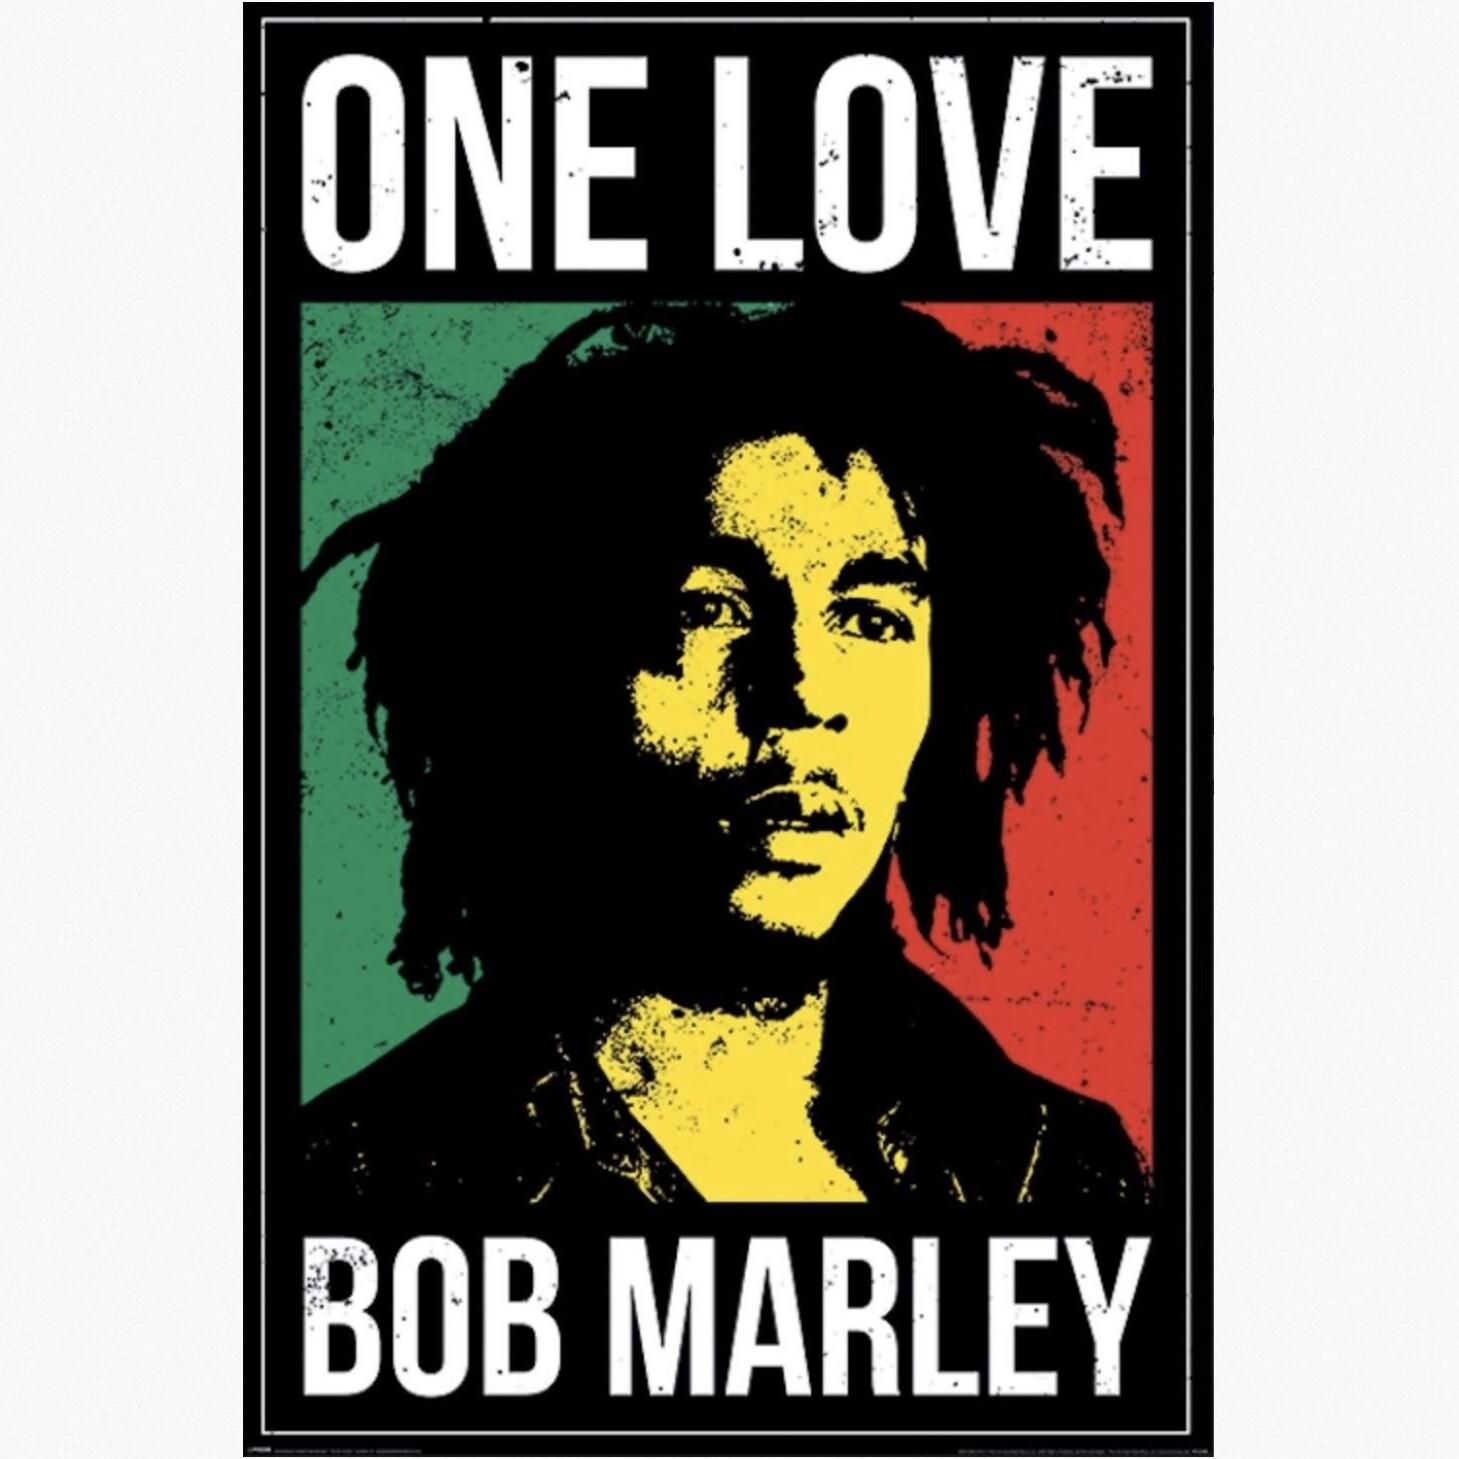 BOB MARLEY ONE LOVE POSTER